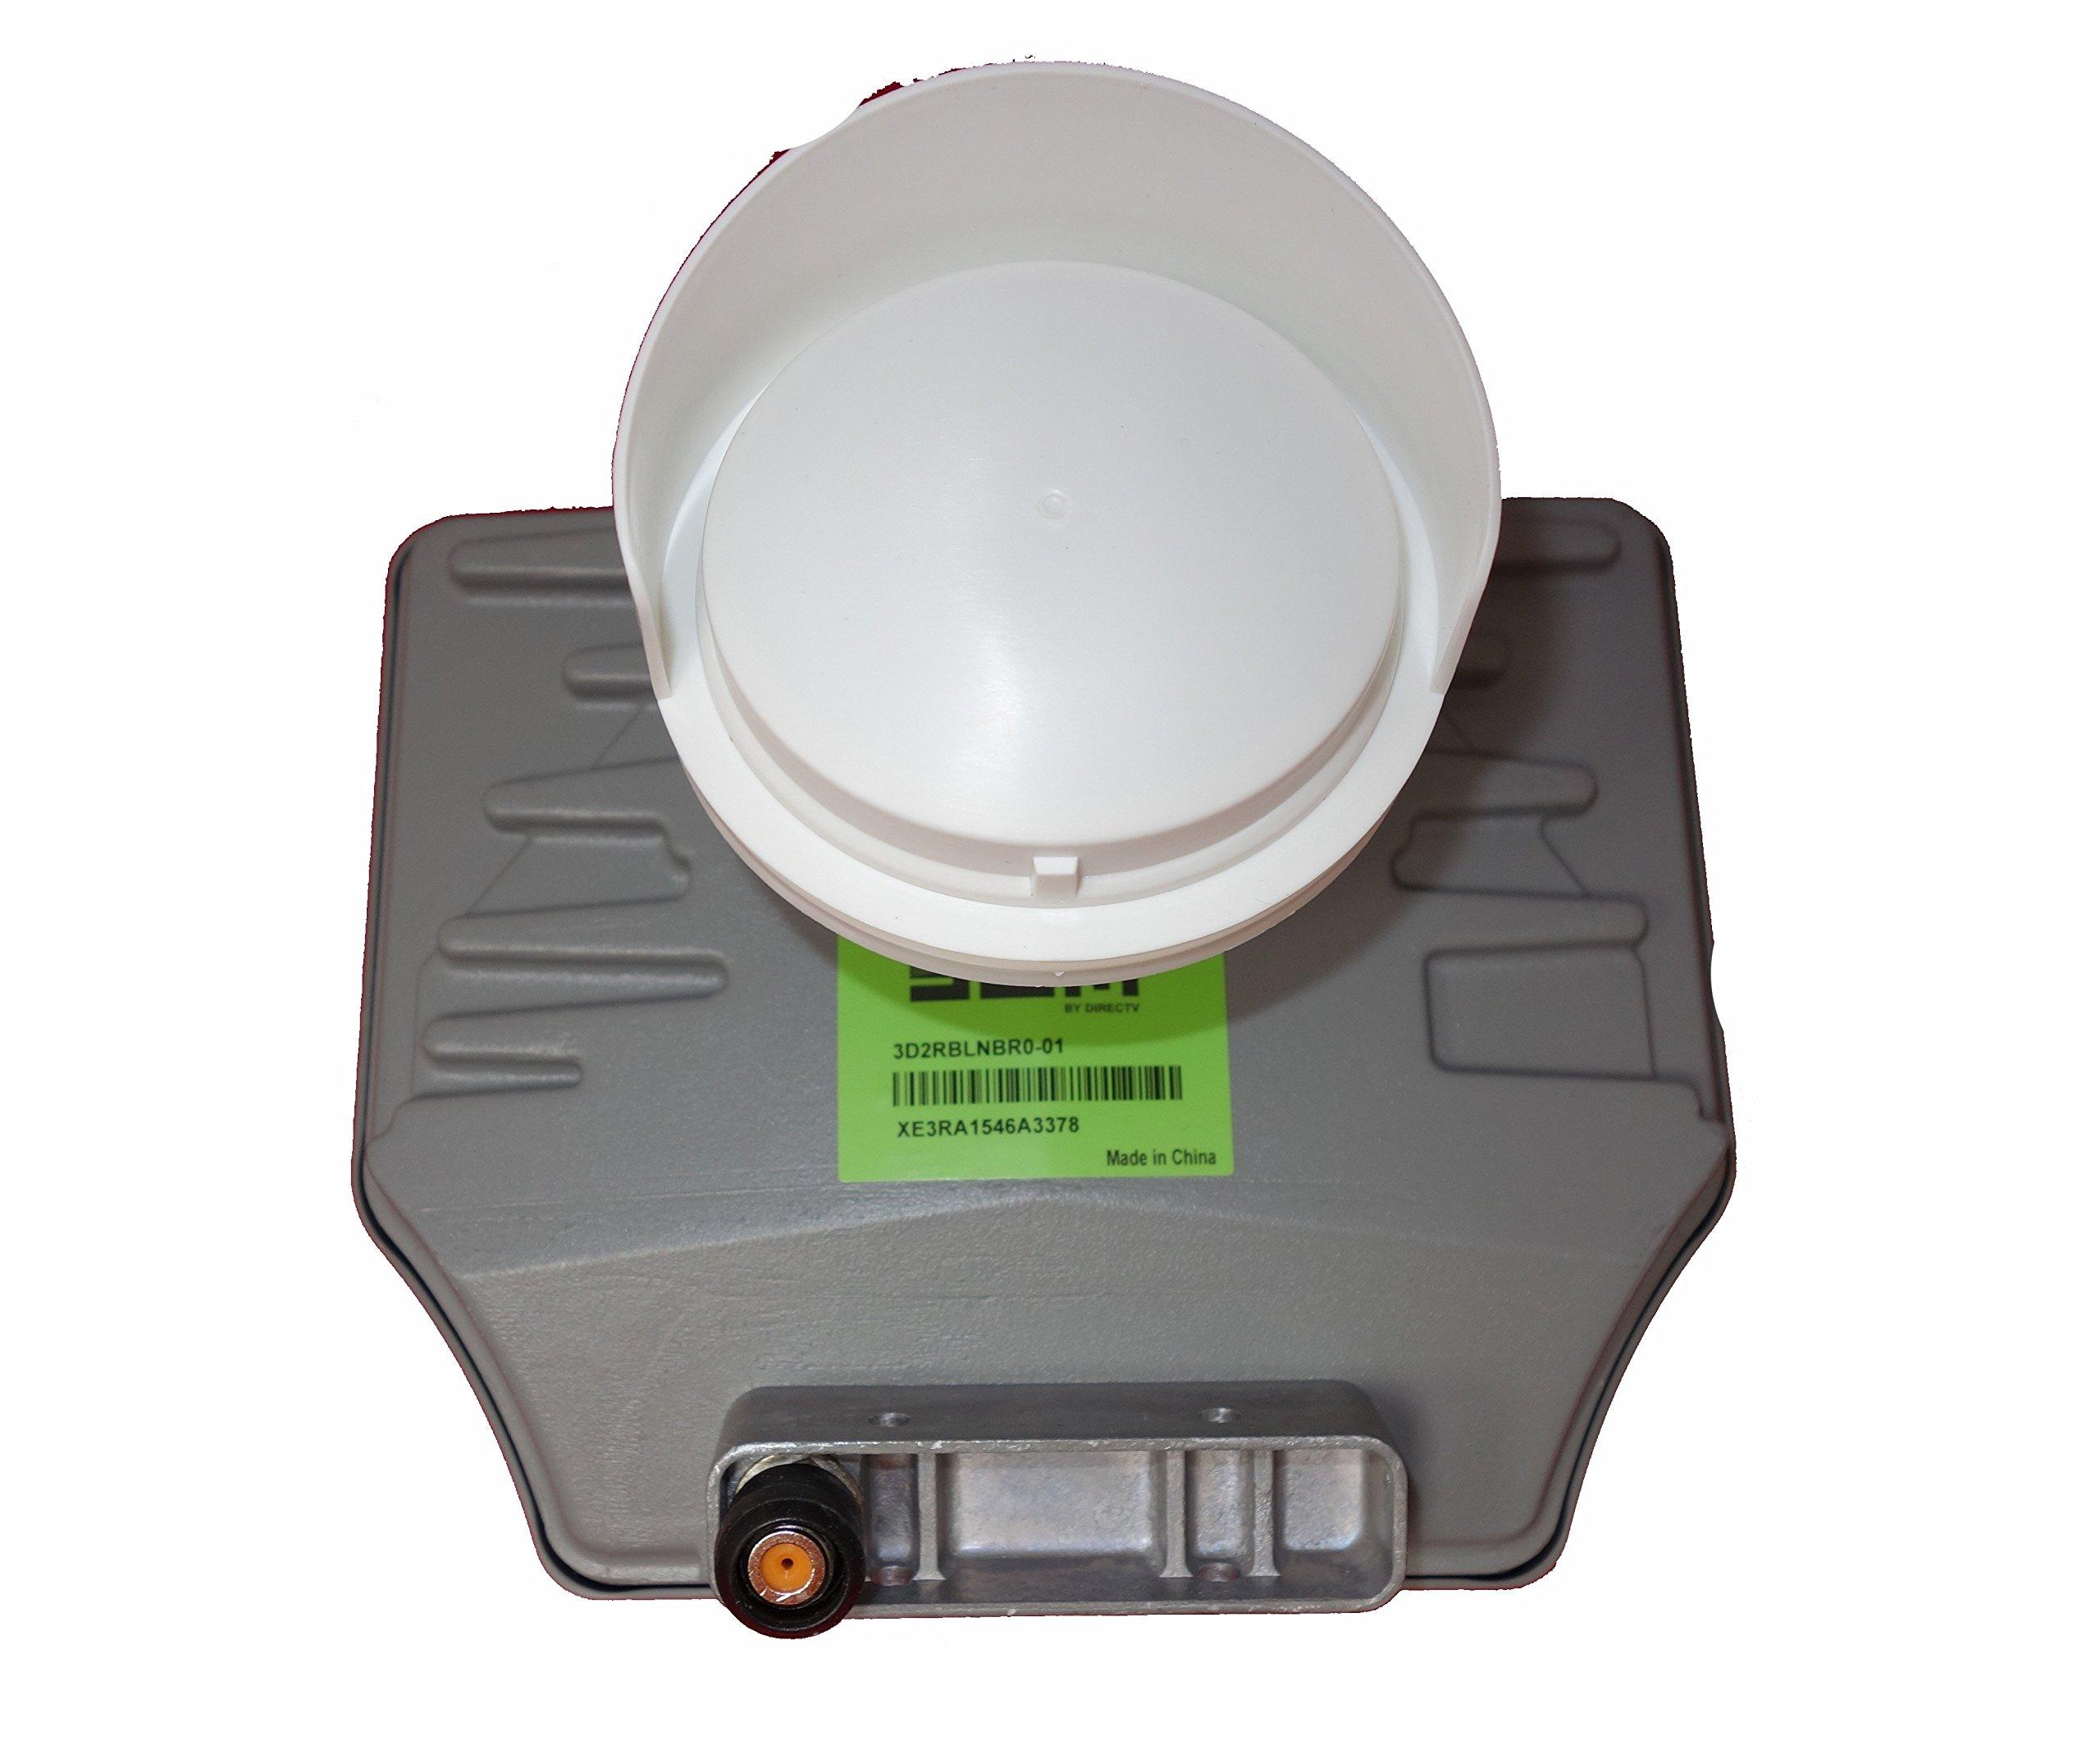 DIRECTV SWM13 3D2RBLNB UltraHD LNB for SlimLine Dish by DIRECTV